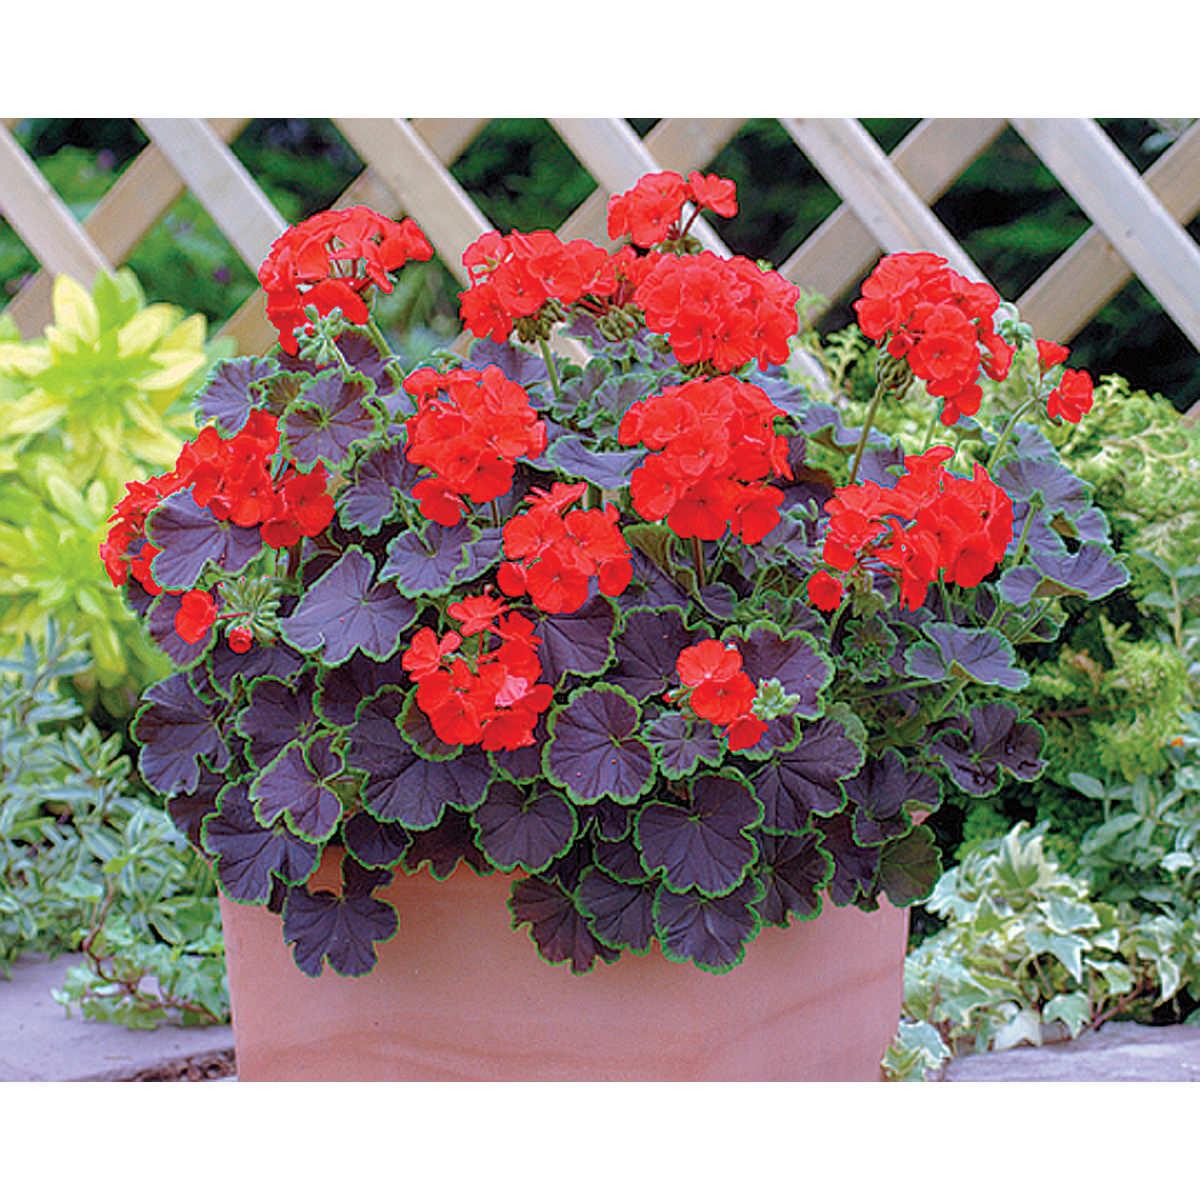 Black Velvet F1 Hybrid Scarlet Geranium Seeds Ne Seed